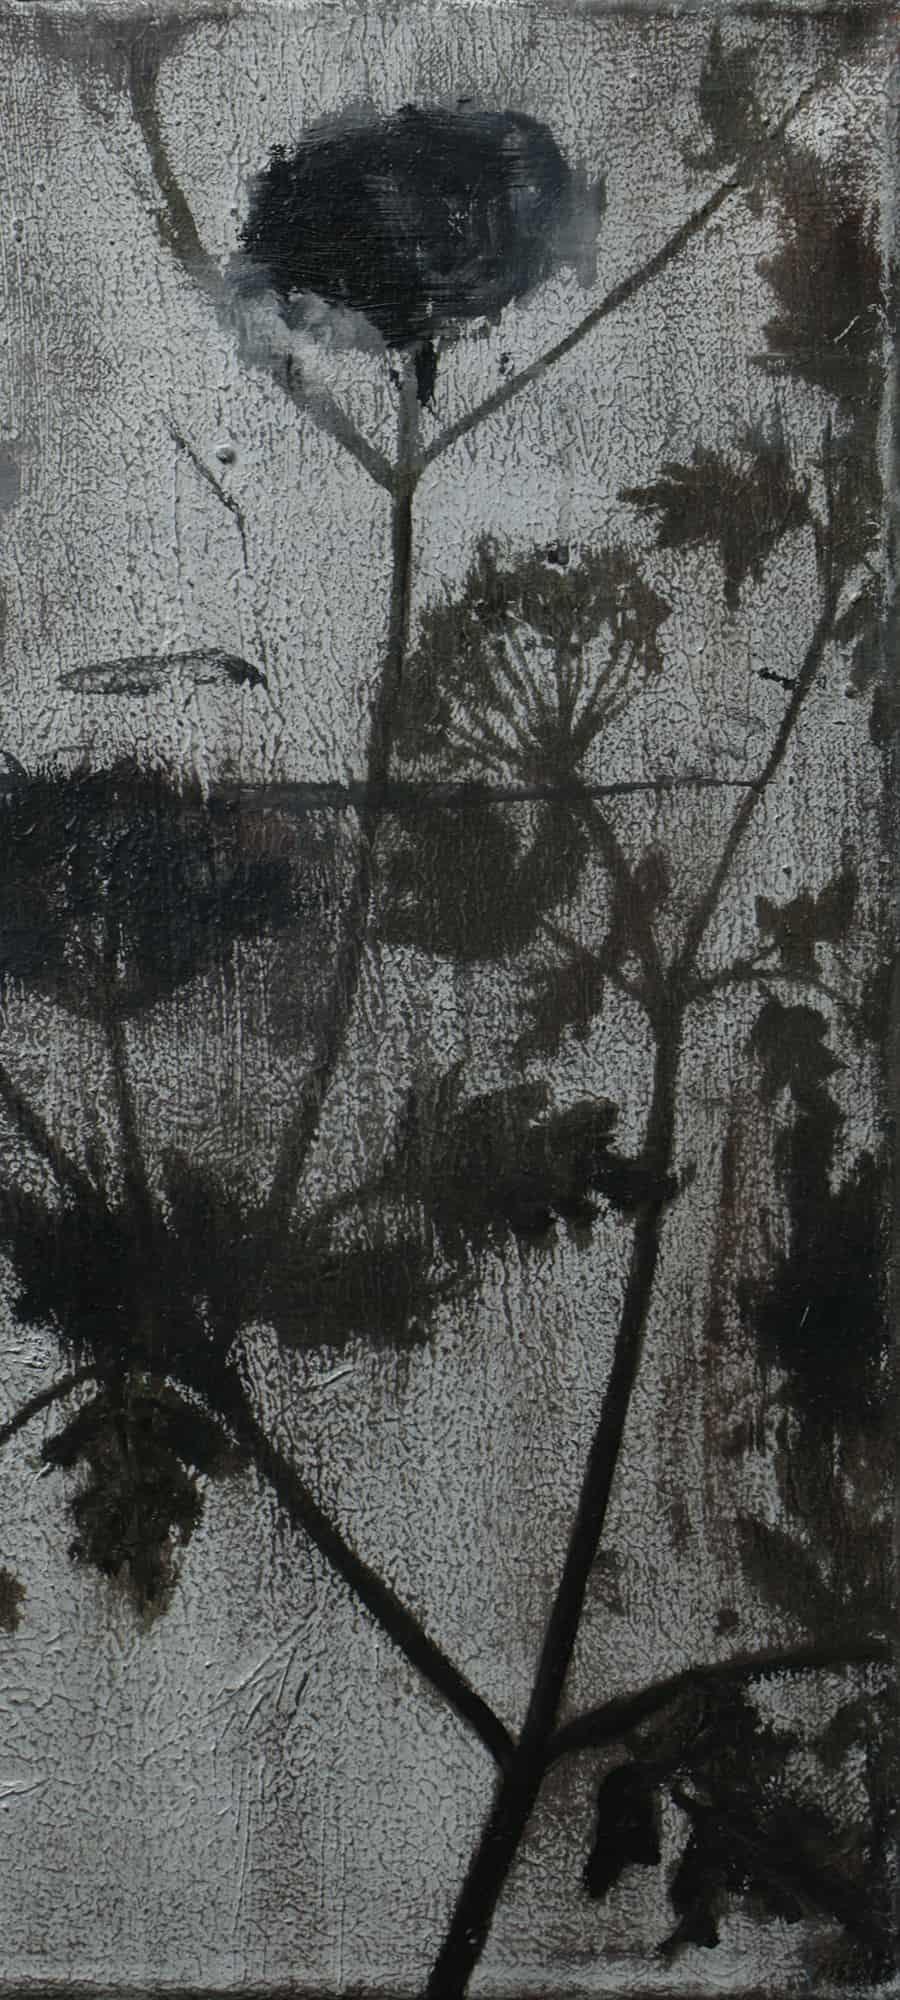 Paweł Baśnik, Hemlock (detail), oil and acril painting on canvas, 40x30cm, 2017